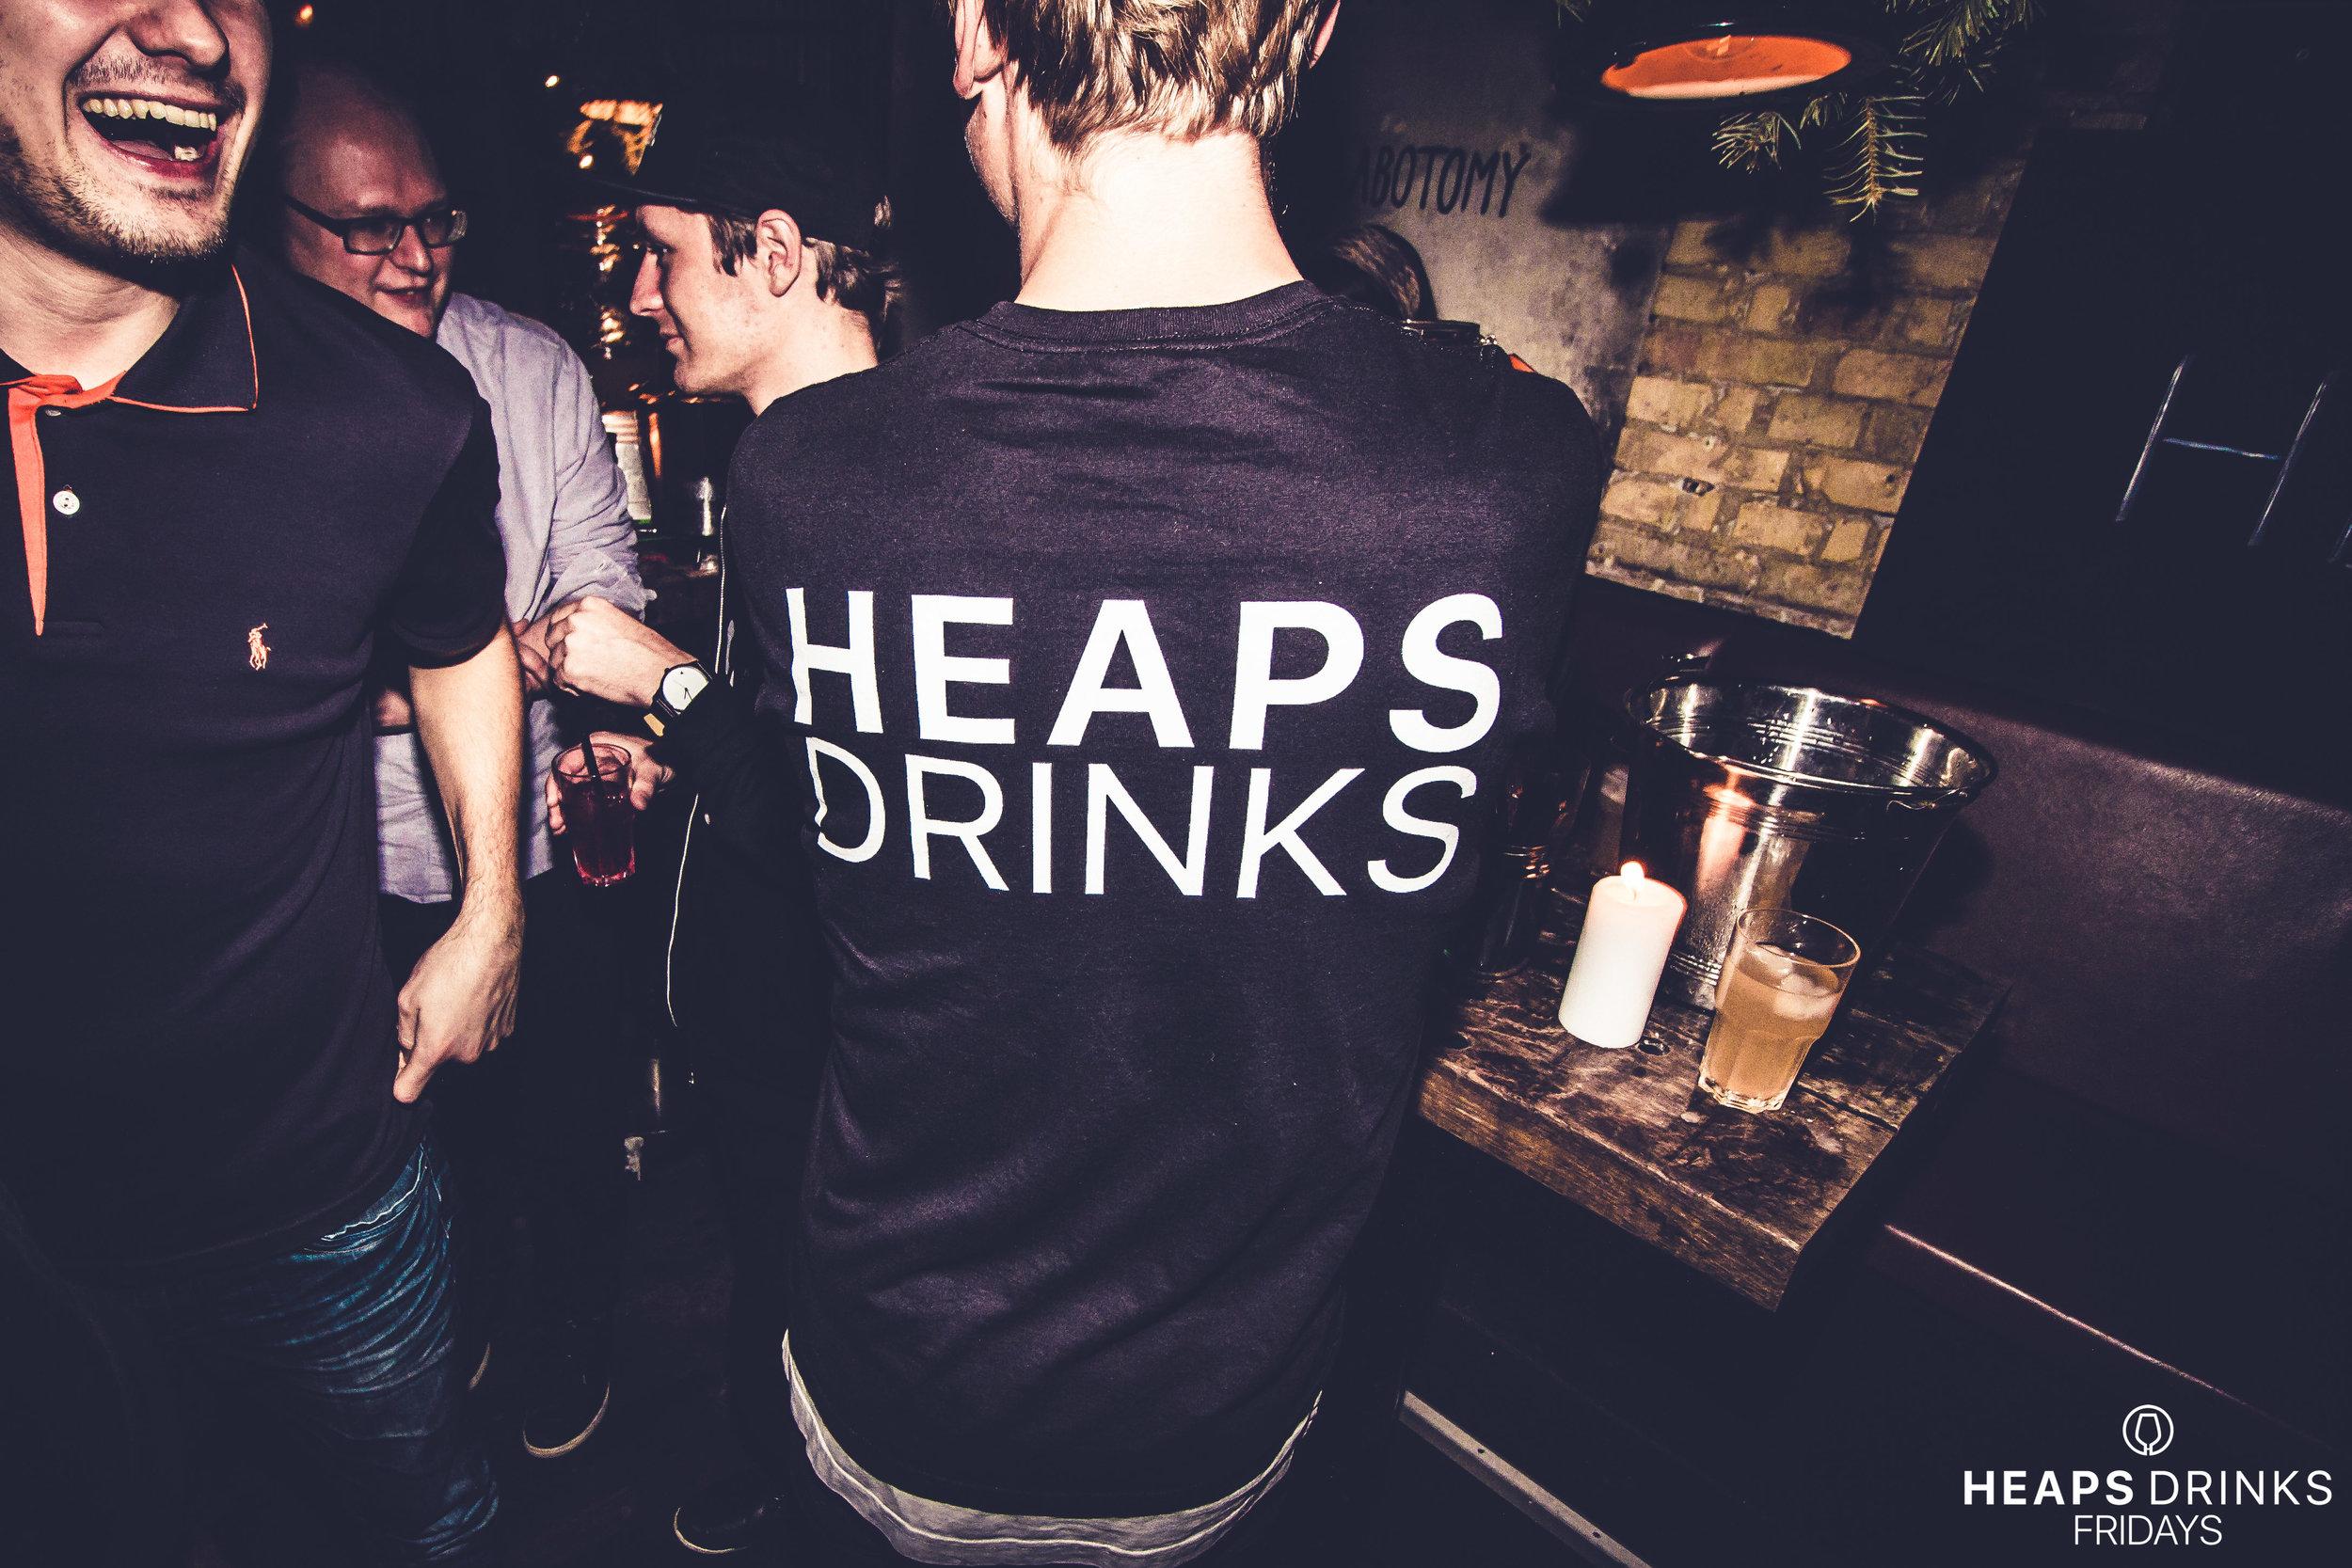 Heaps_drinks_35.jpg